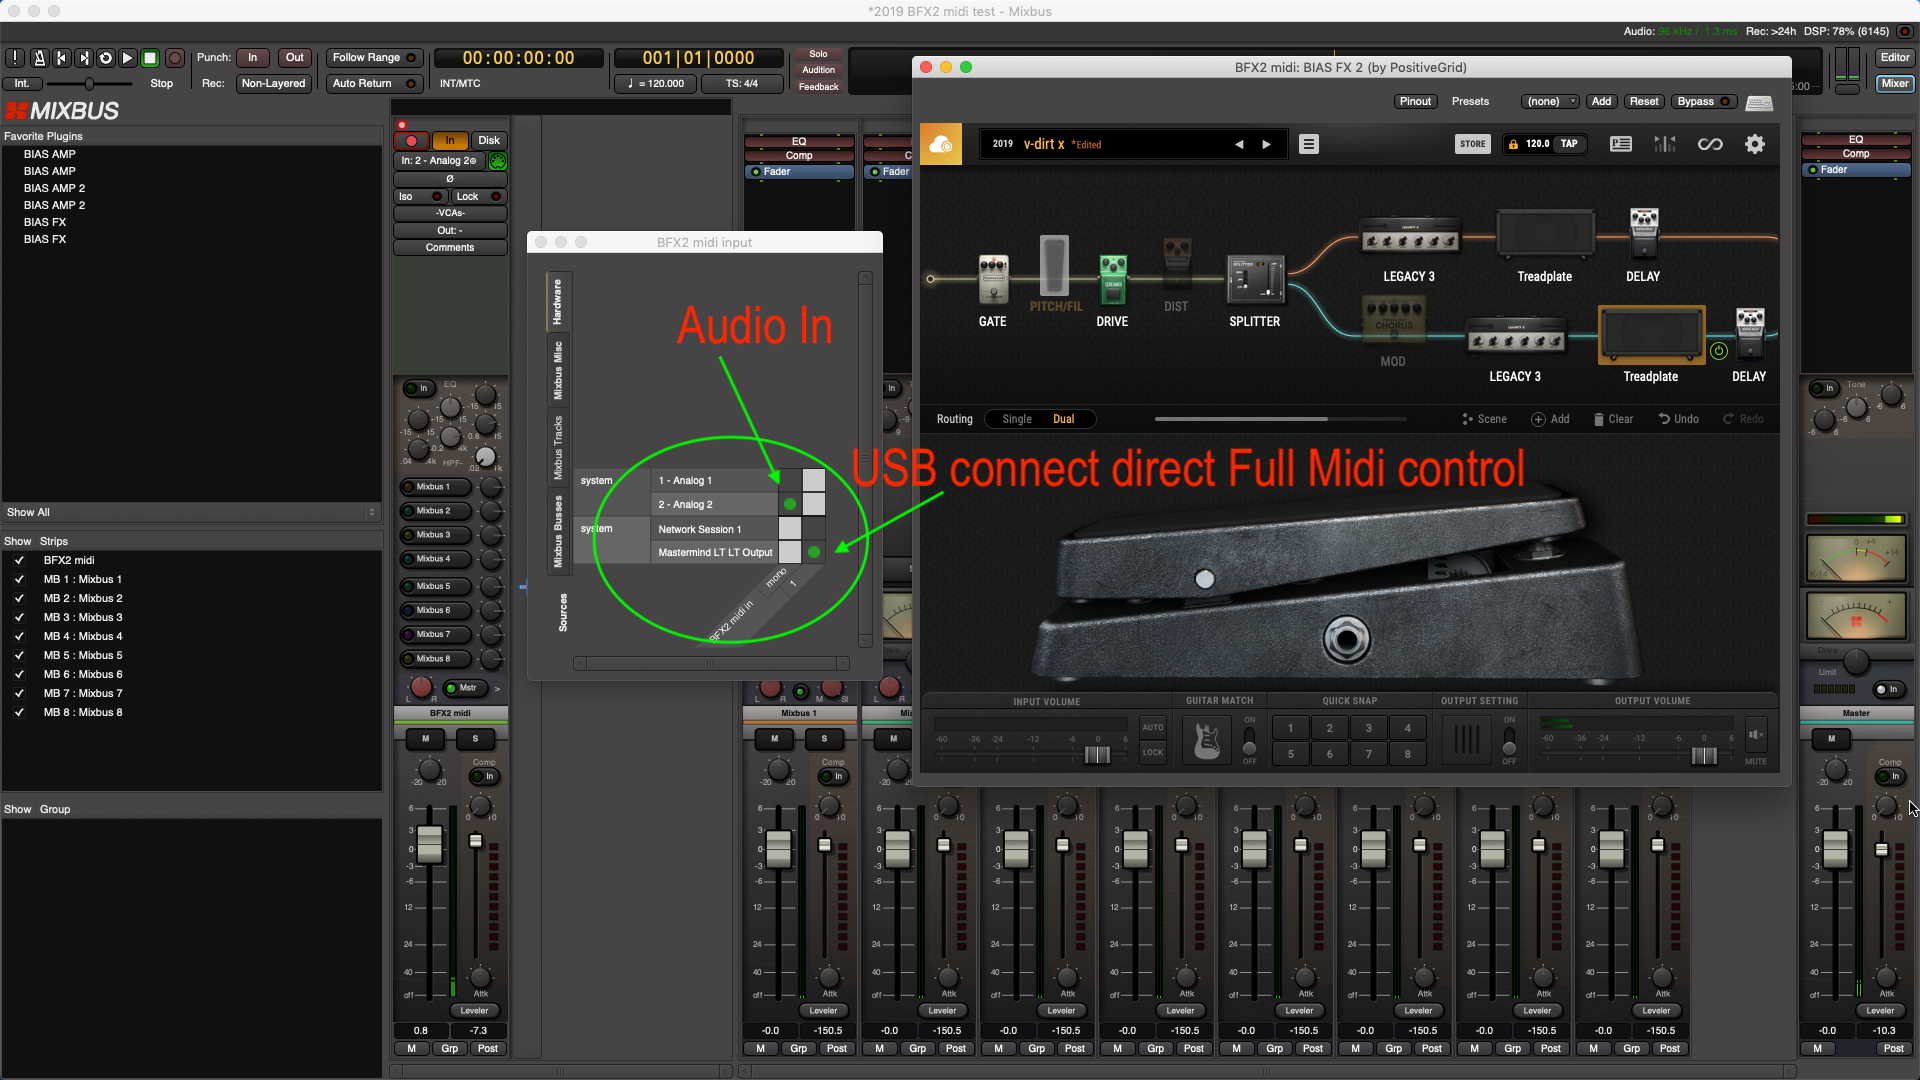 0_1557868203895_Mixbus BiasFX2 midi + audio.png